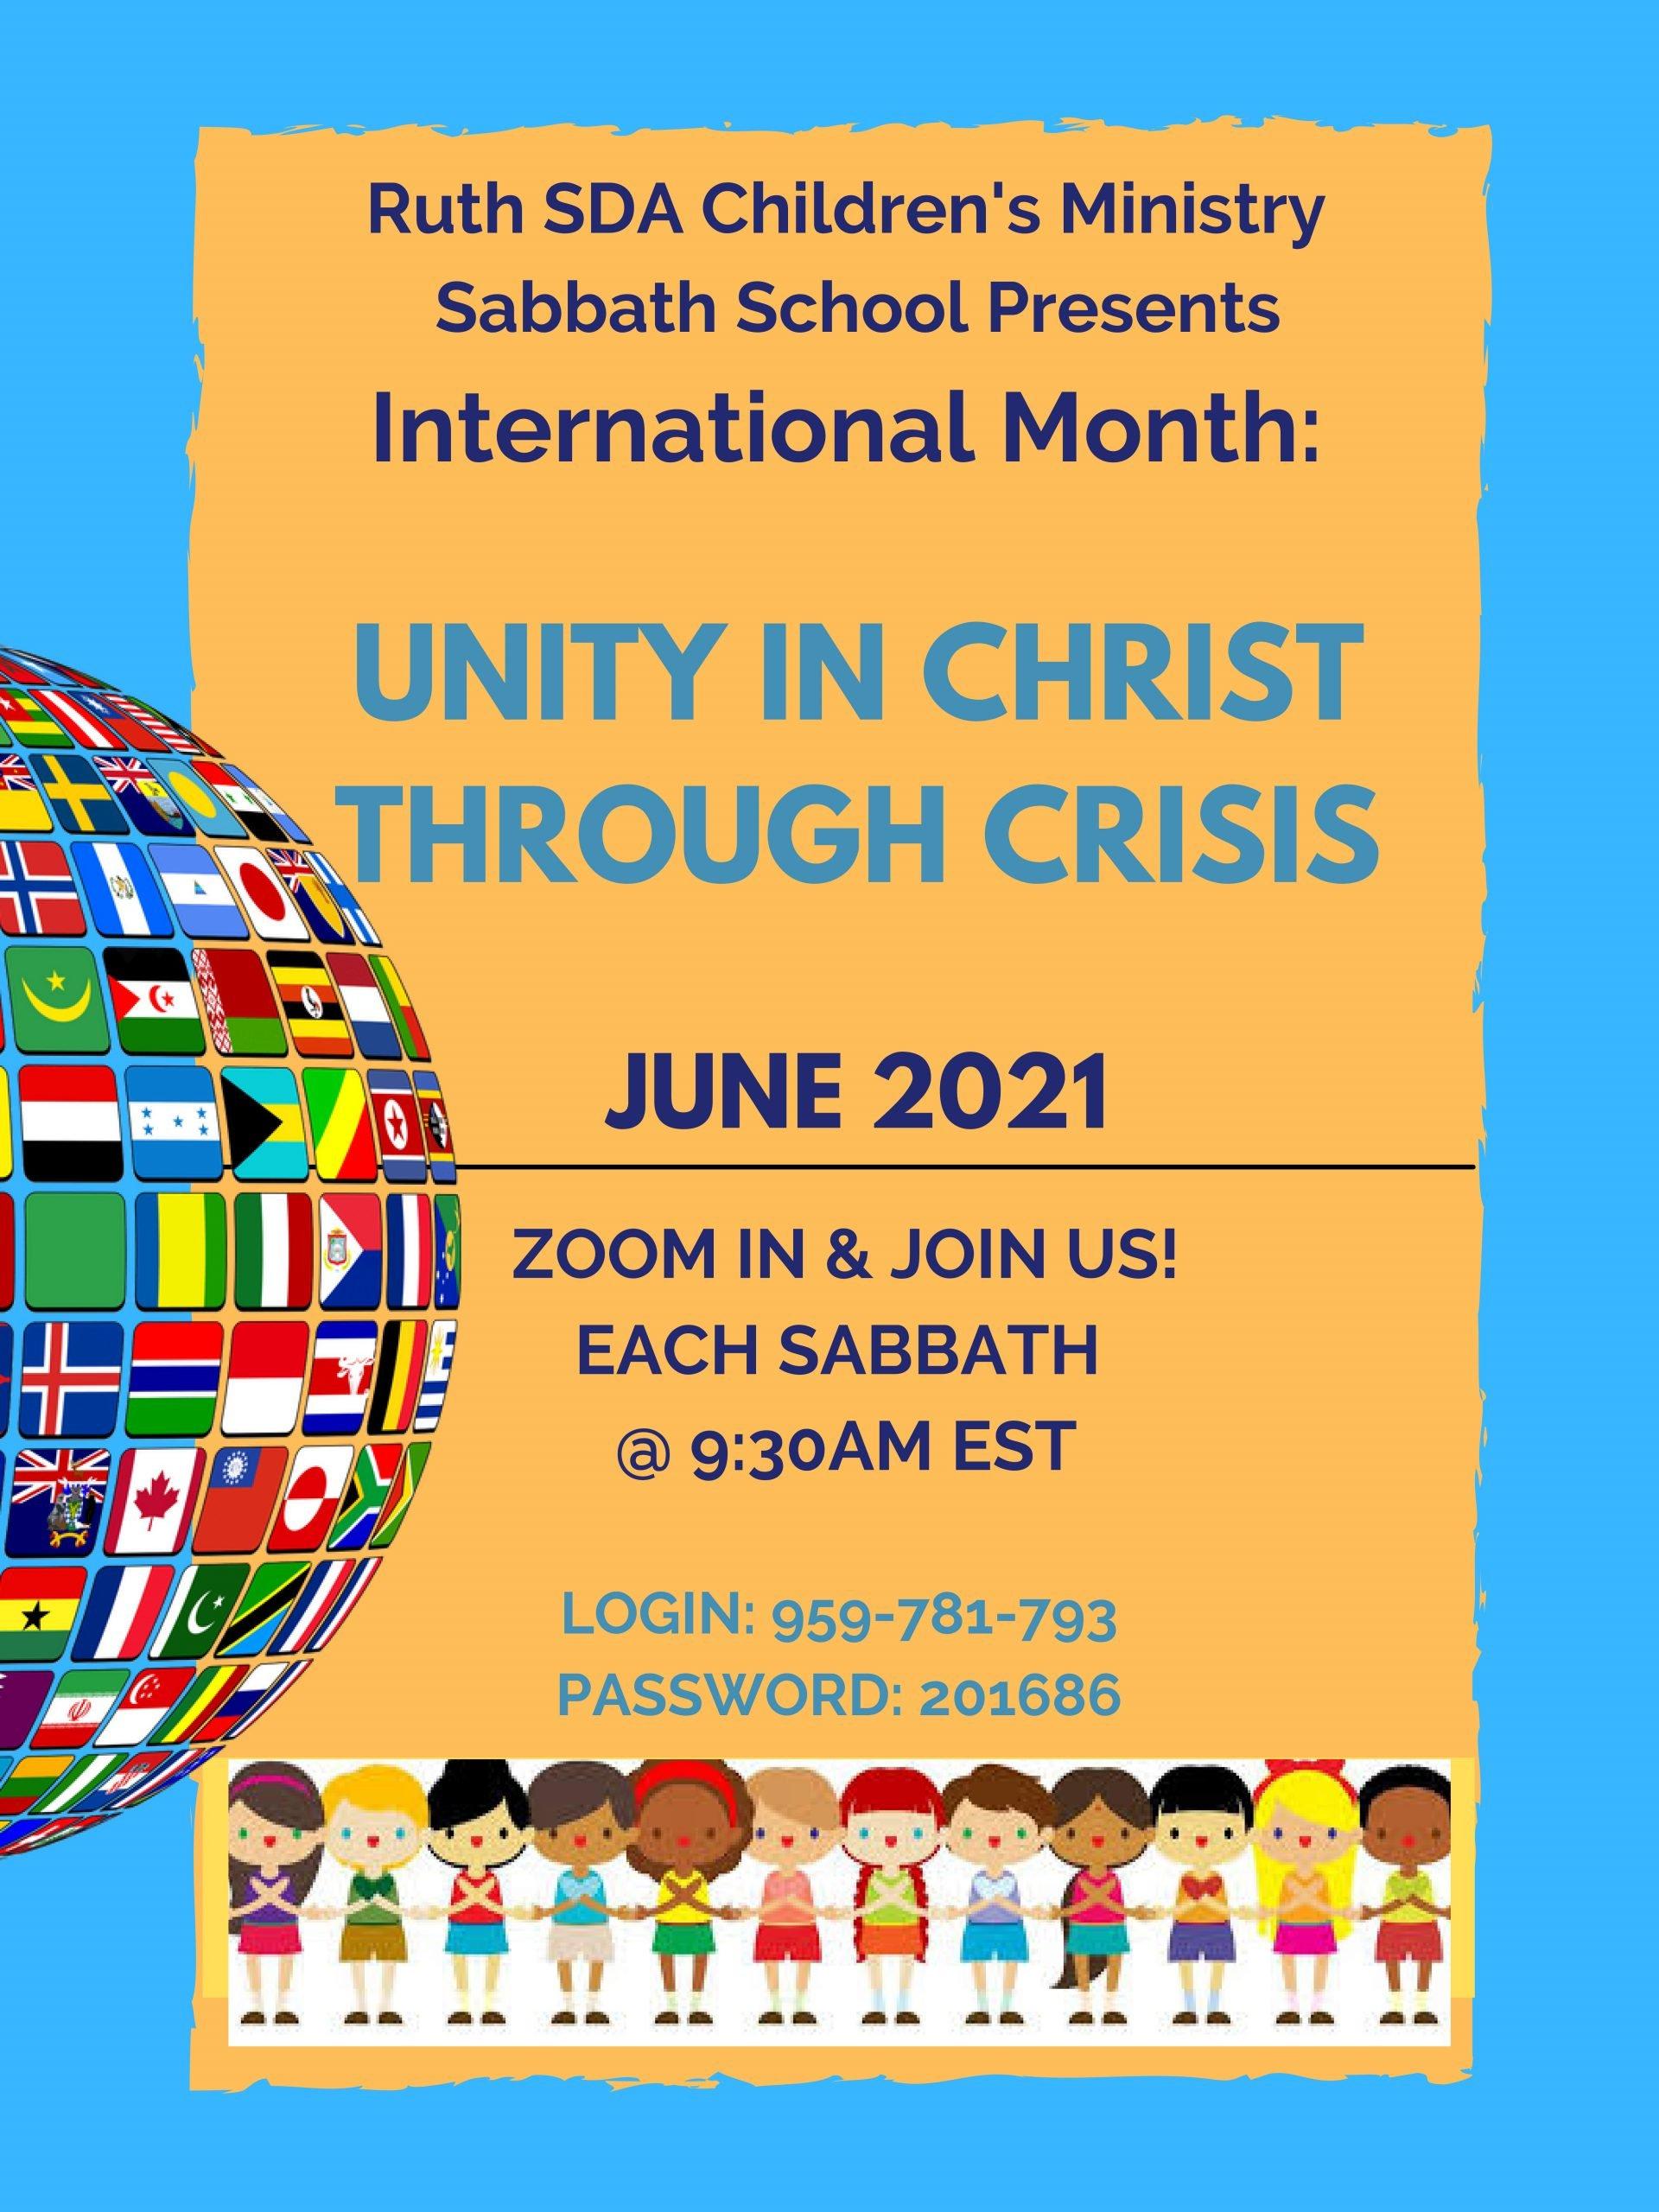 Ruth-SDA-Children's-Ministry_June-2021